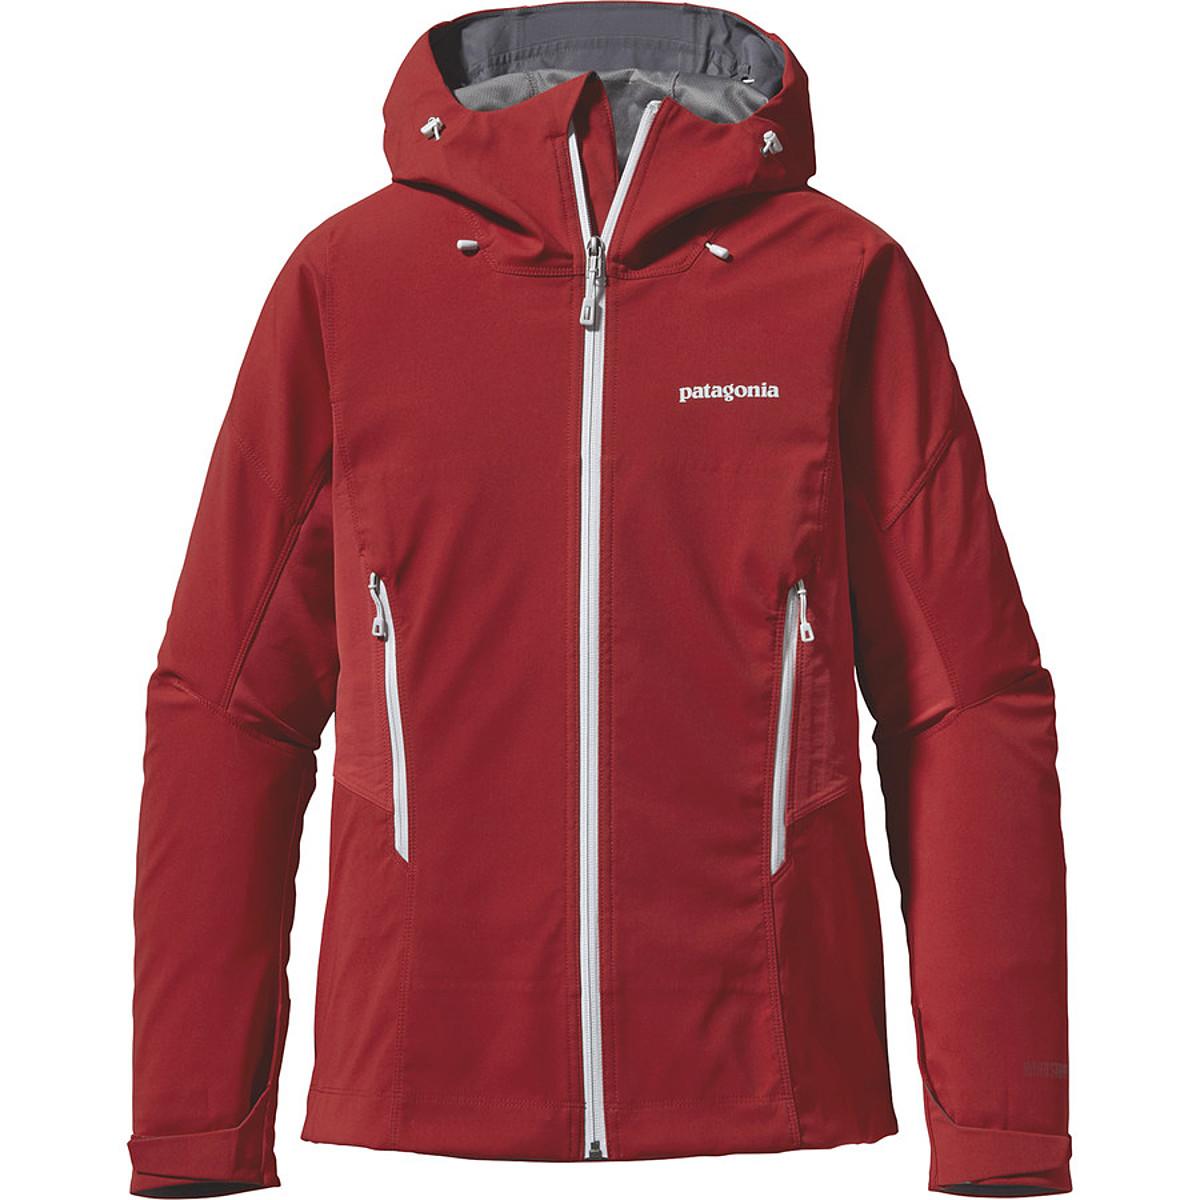 Patagonia Dimensions Jacket